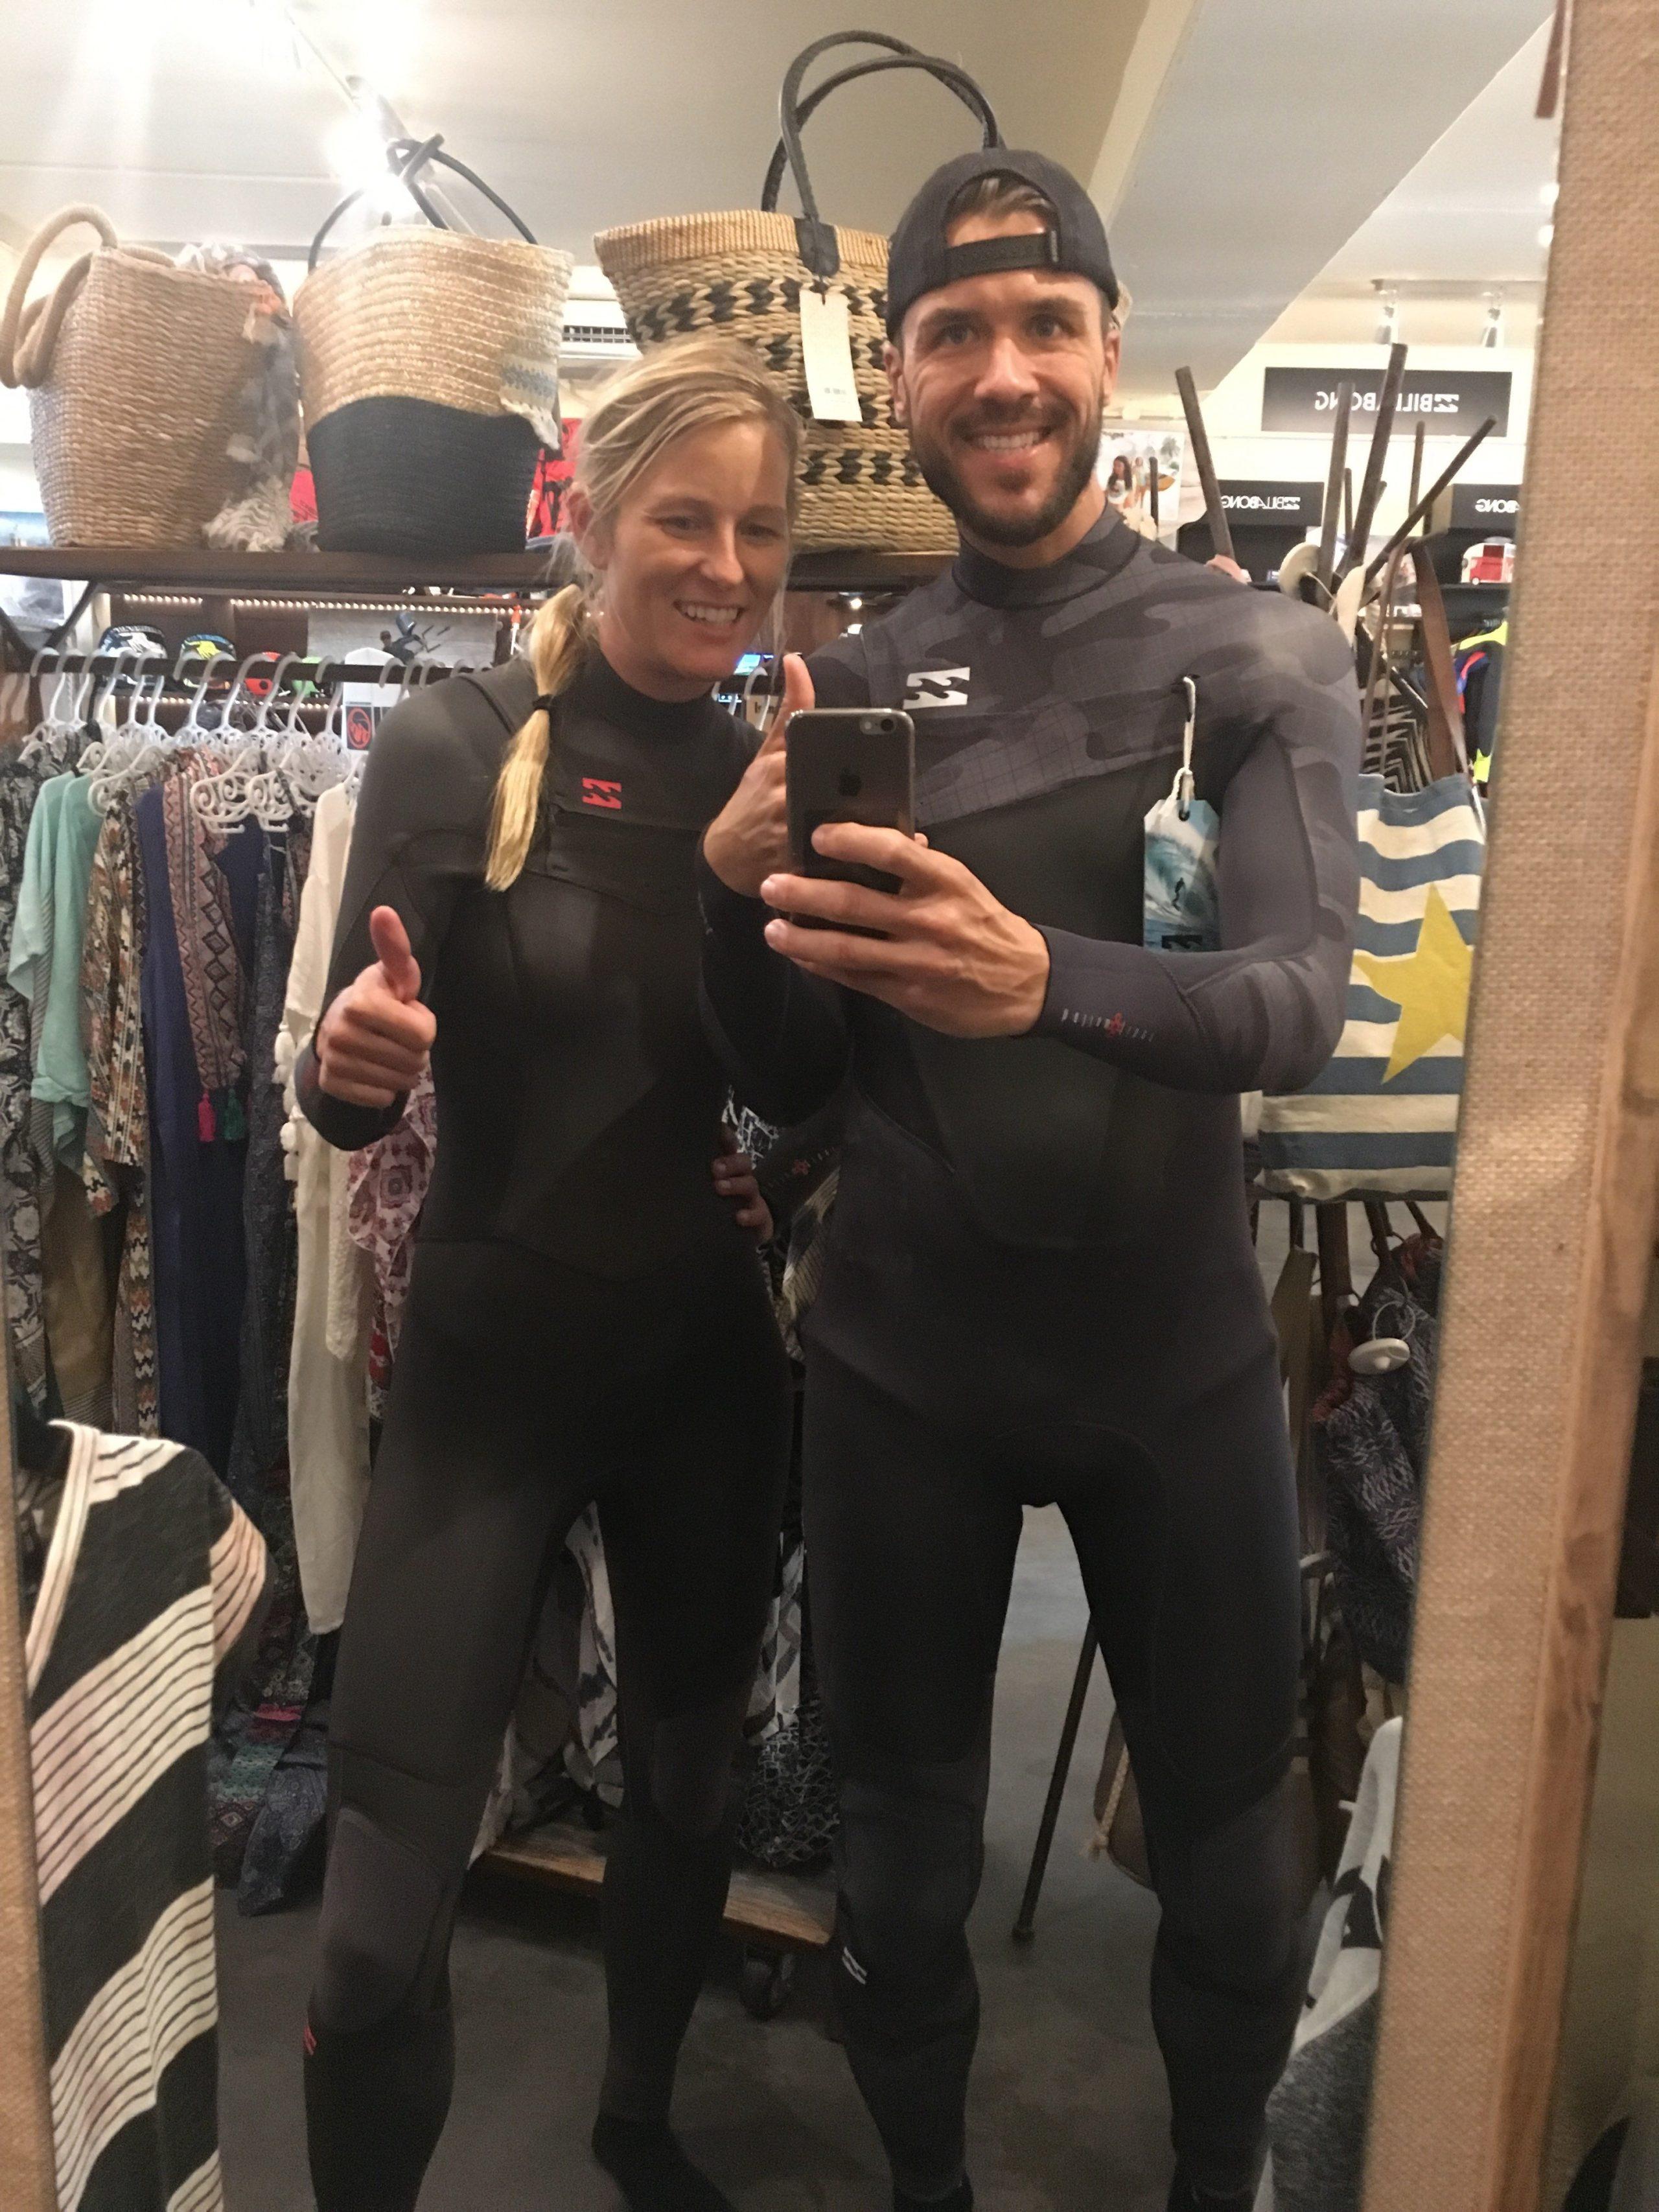 Feli und Marcus Selfie in Wetsuits